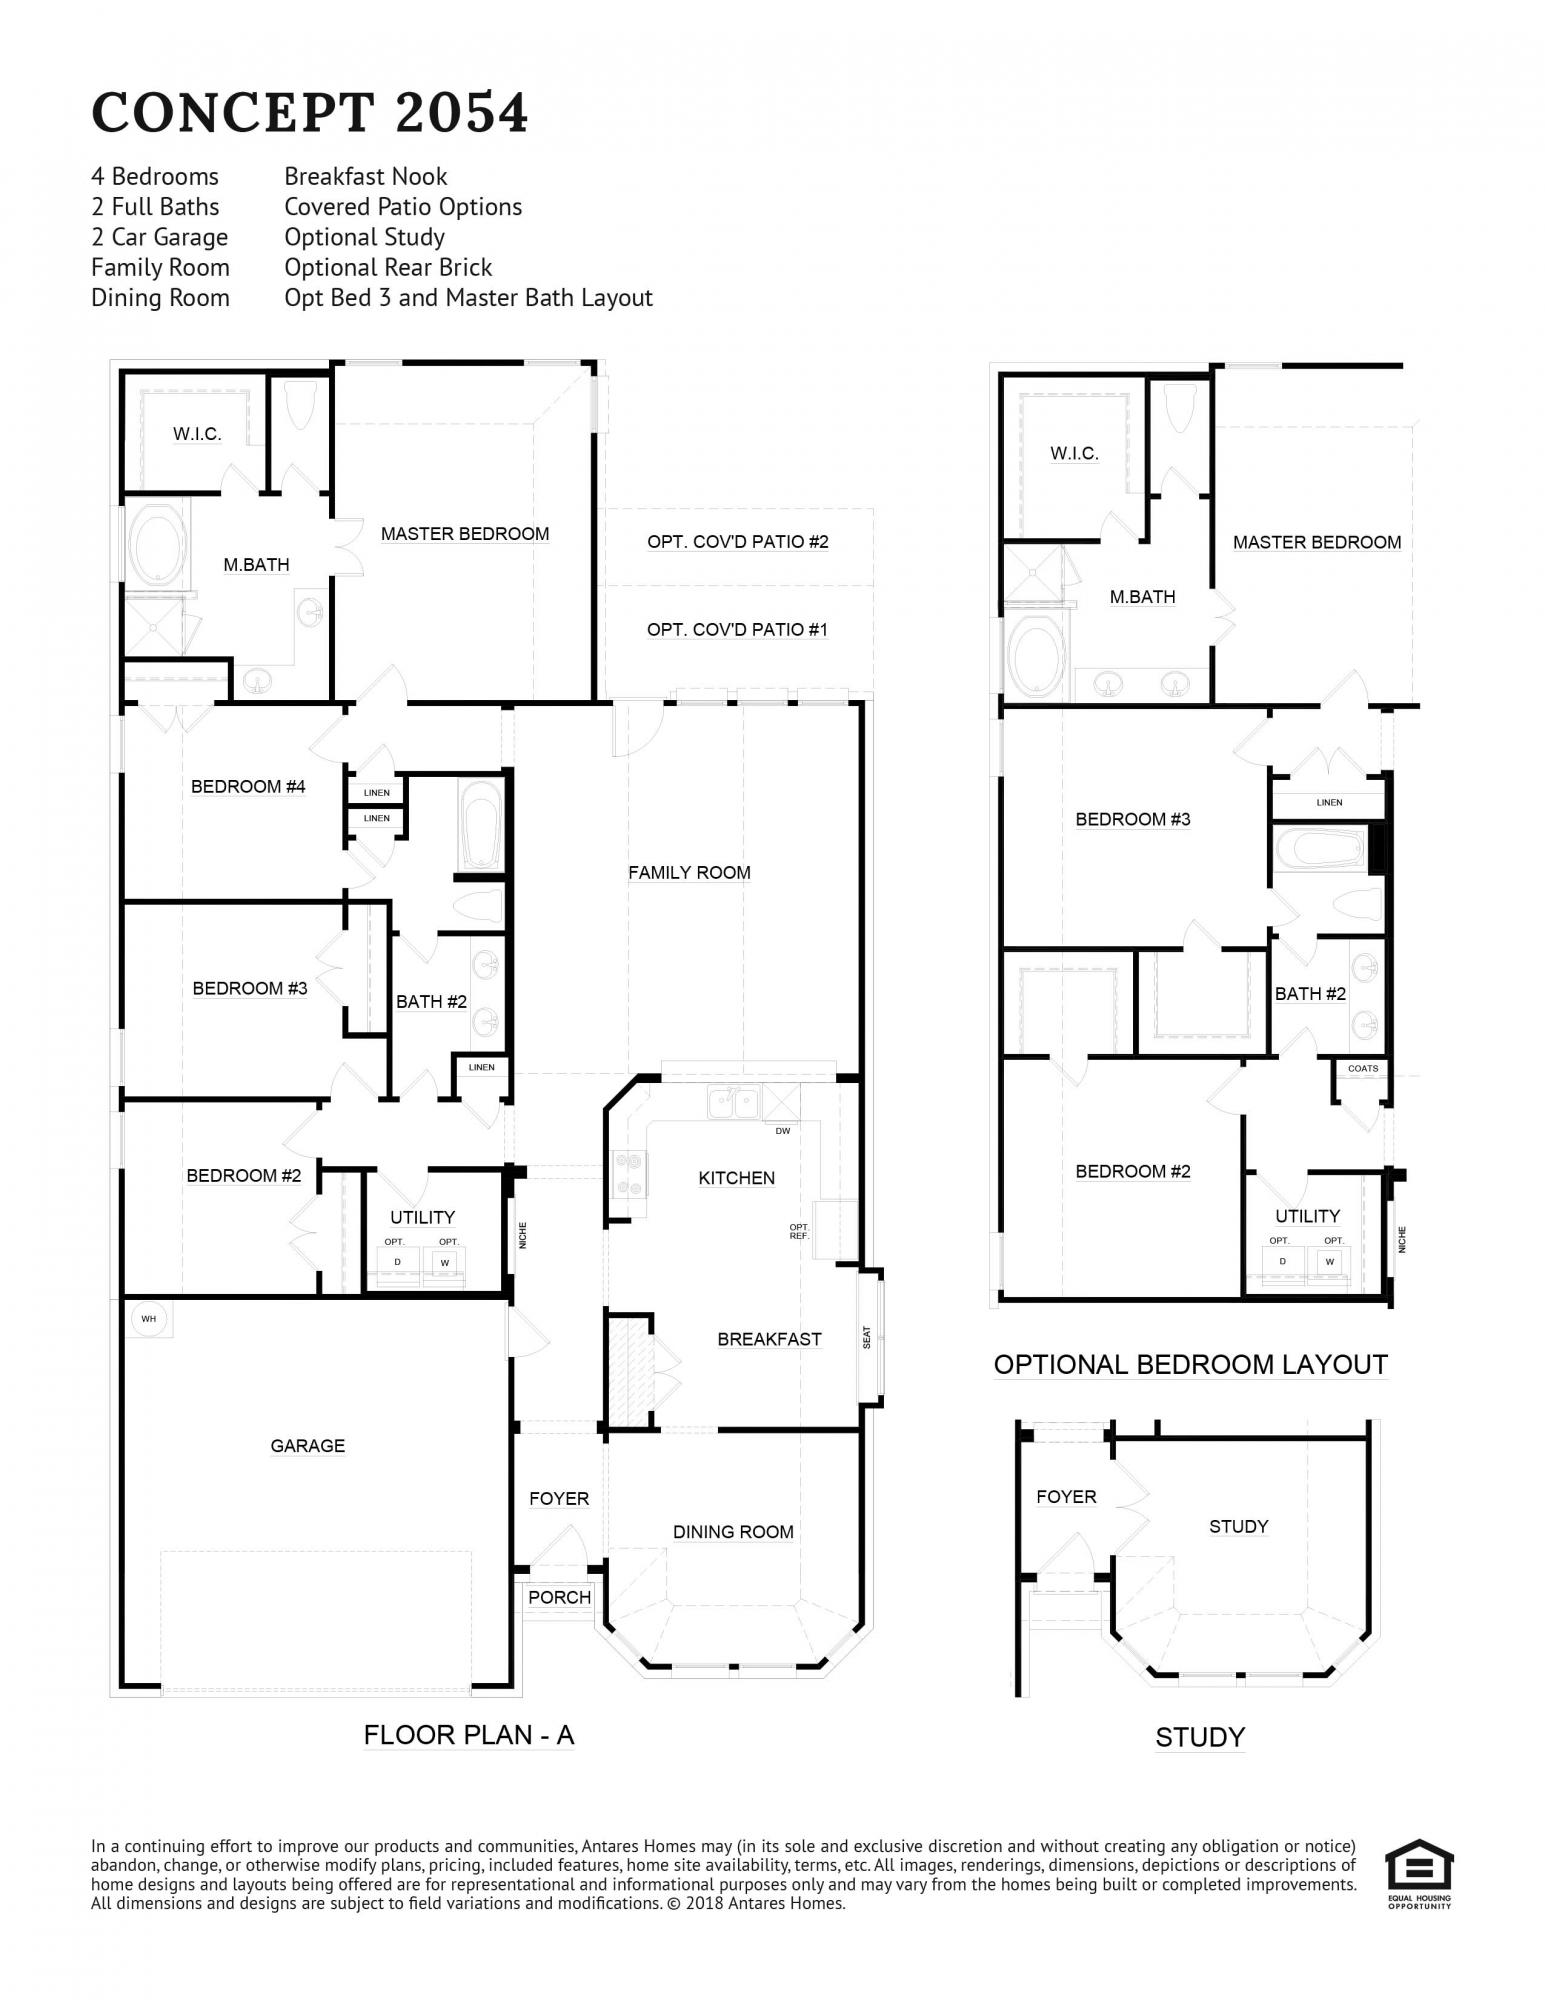 Concept 2054 Floorplan